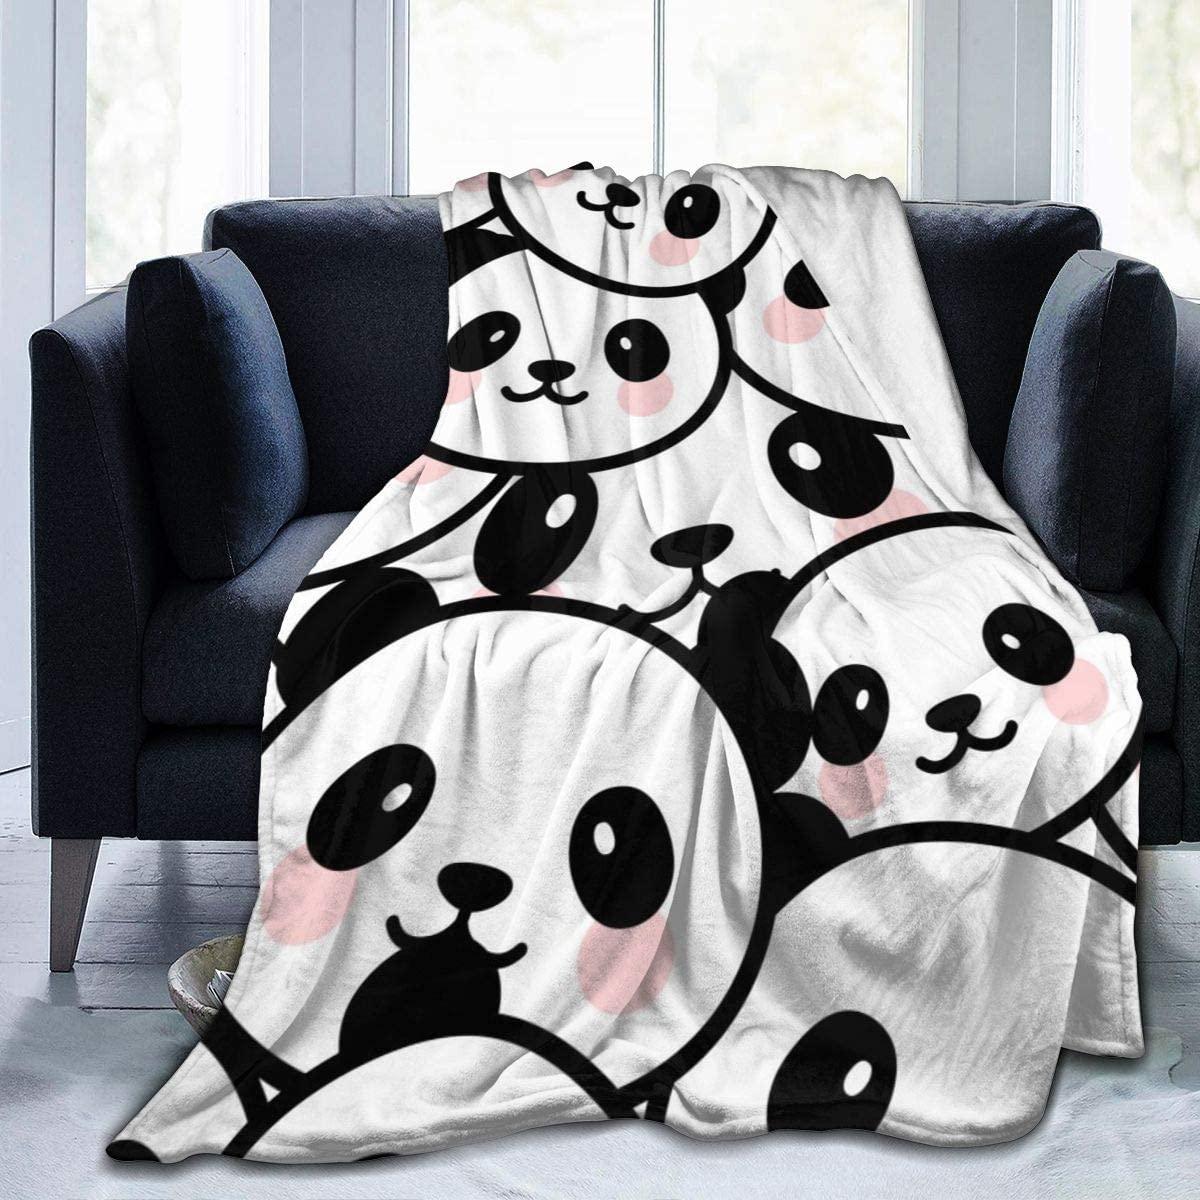 Micro Fleece Plush Soft Baby Blanket Fun Cute Cartoon Panda Face Fluffy Warm Toddler Bed/Crib Blanket Lightweight Flannel Daycare Nap Kids Sleeping Tummy Time Throw Blanket Girls Boy Kid/Baby